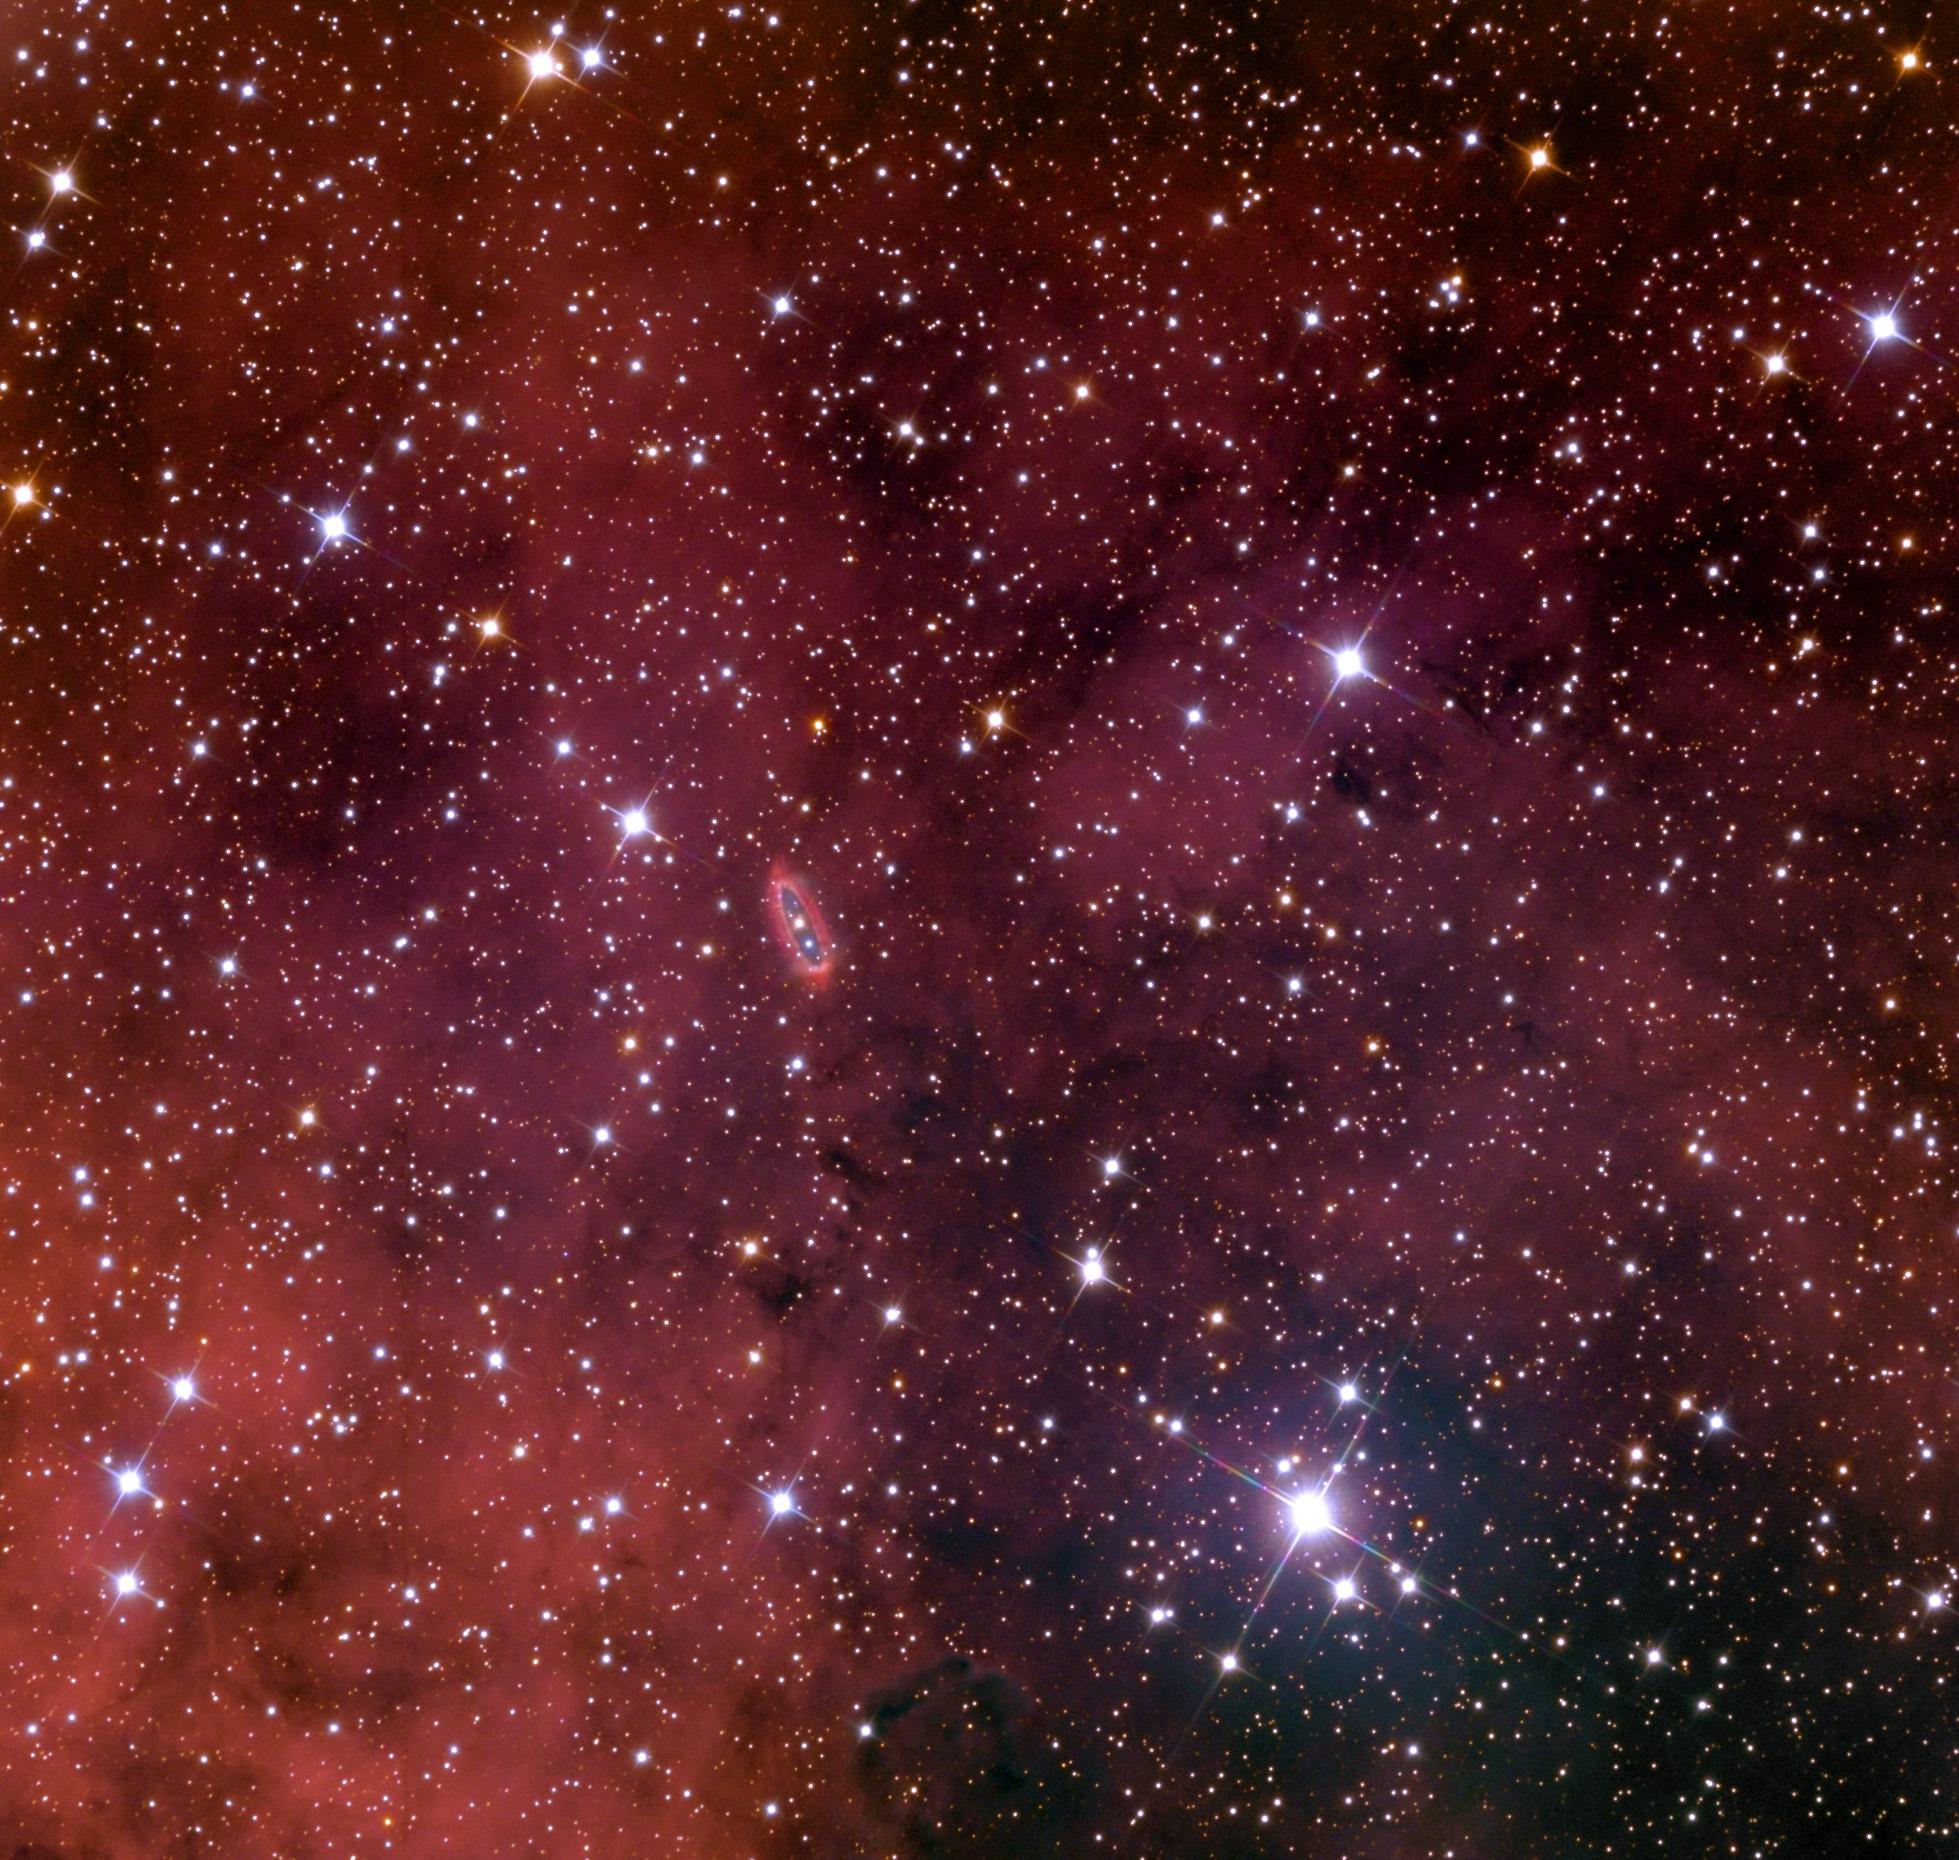 WeBo 1, a strange planetary nebula | The Planetary Society